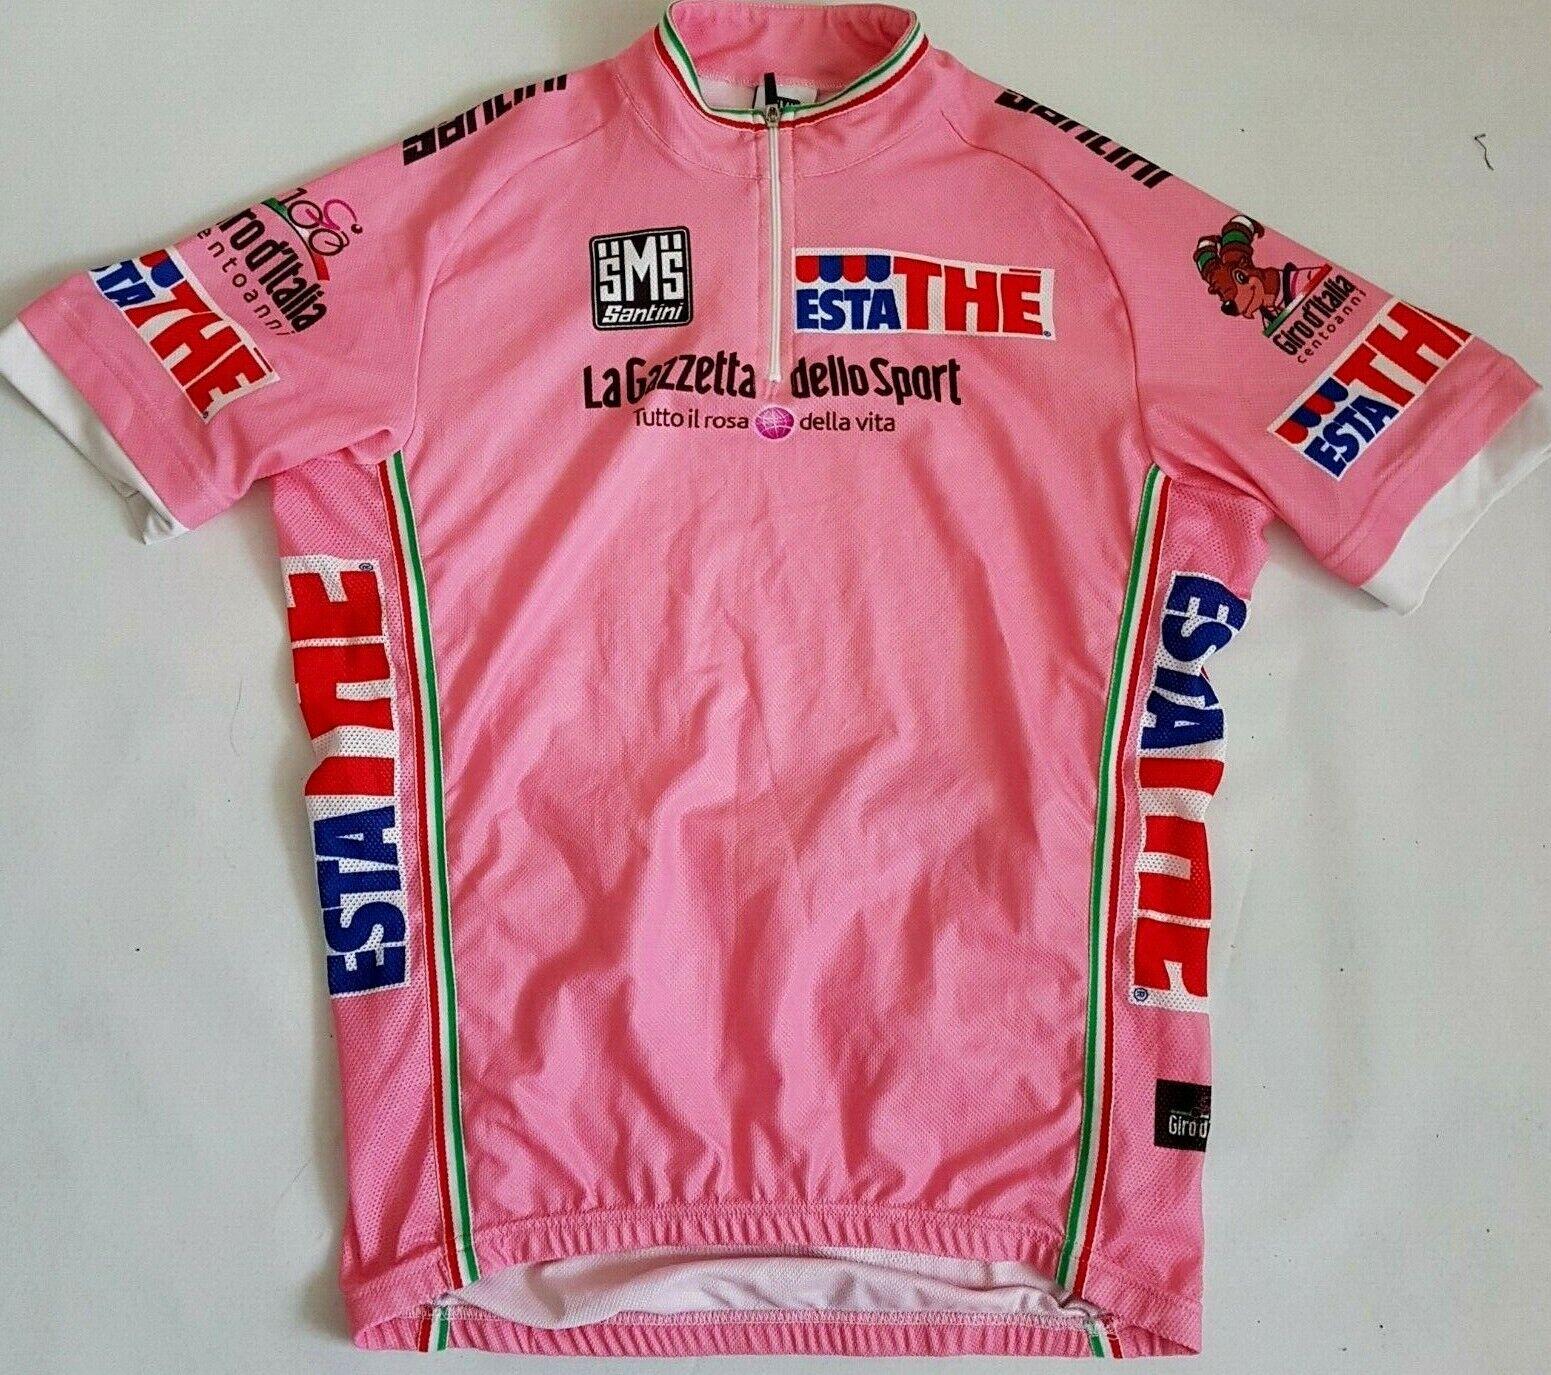 GIRO JERSEY CYCLING  SANTINI PINK 100 2009 General Leader Italia SHORT SLEEVE L  low price